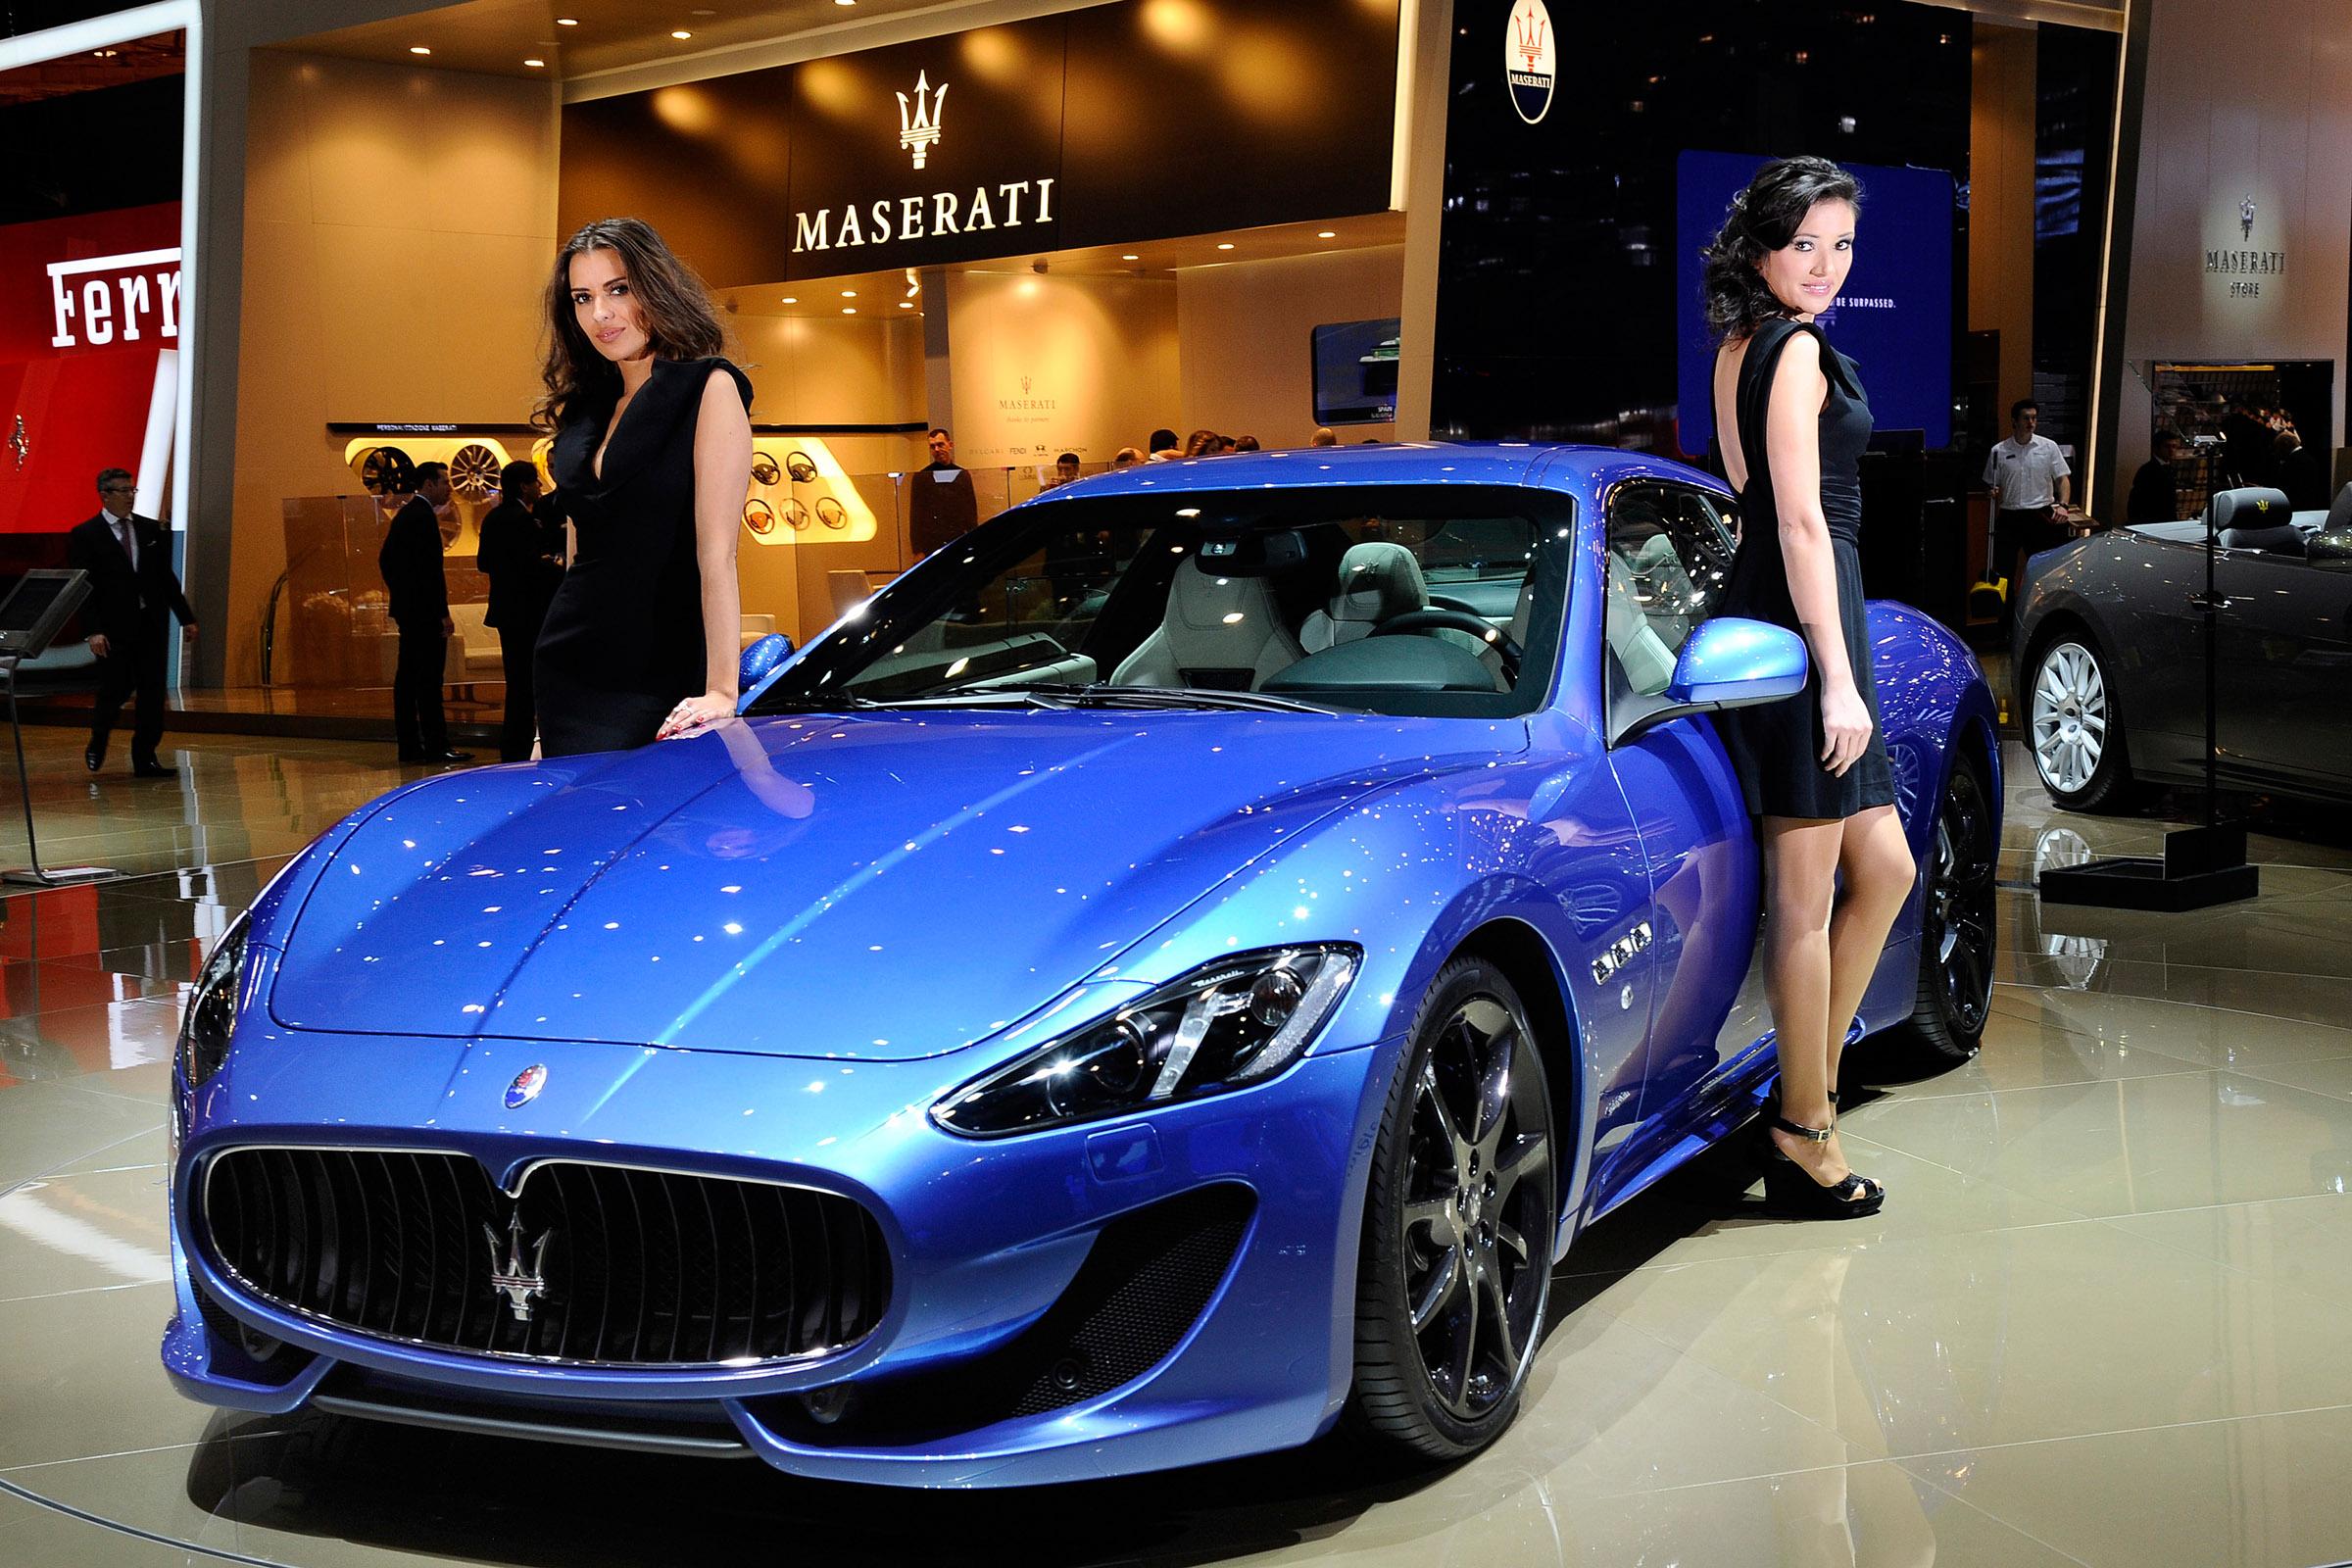 Maserati Granturismo Sport Cost >> 2012 Geneva Motor Show: Maserati GranTurismo Sport